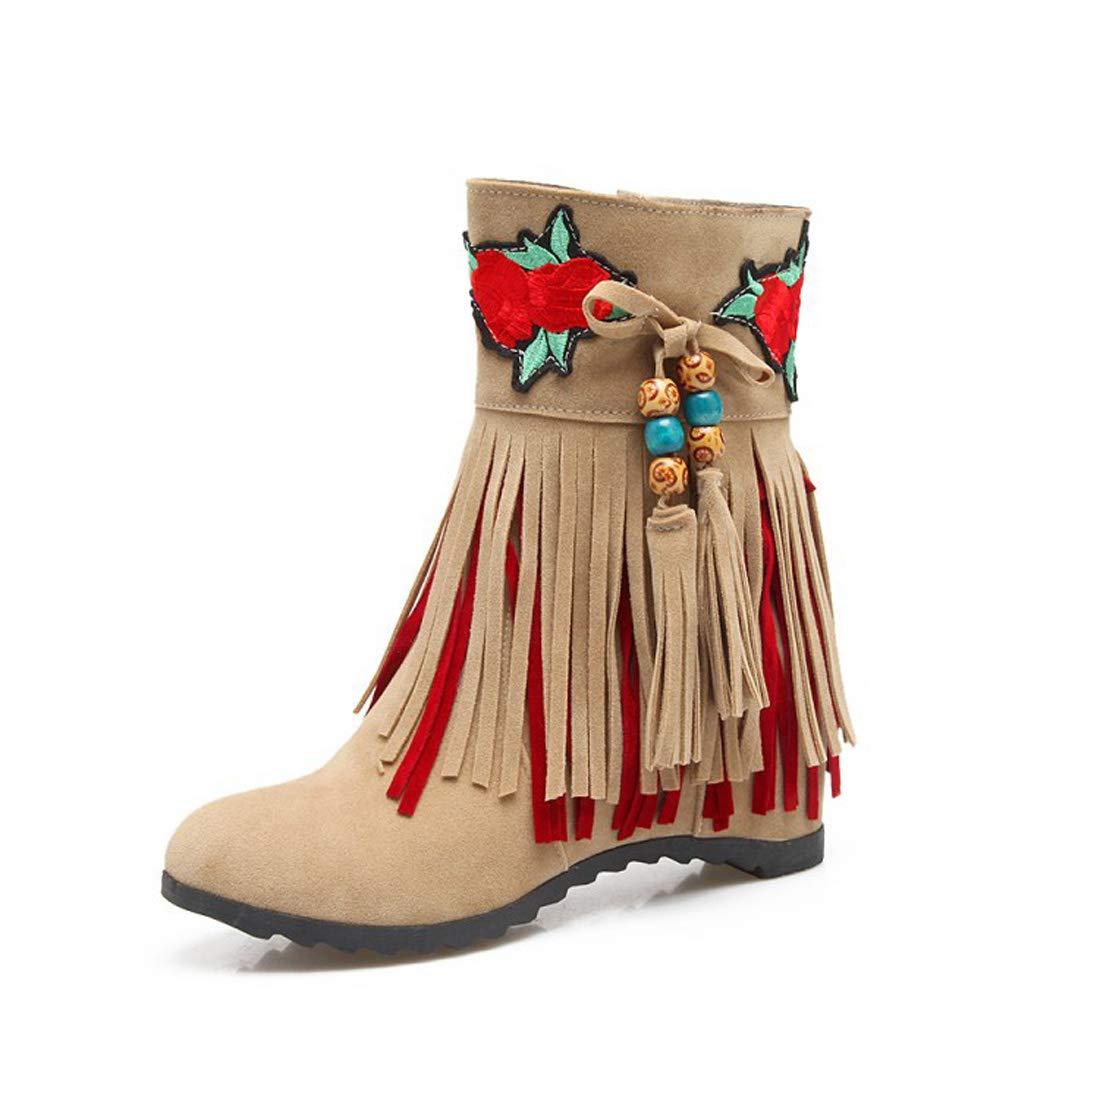 DANDANJIE Damen Stiefel Herbst Winter Bohemian Invisible Heel Stiefelies Quaste Stiefeletten Schuhe